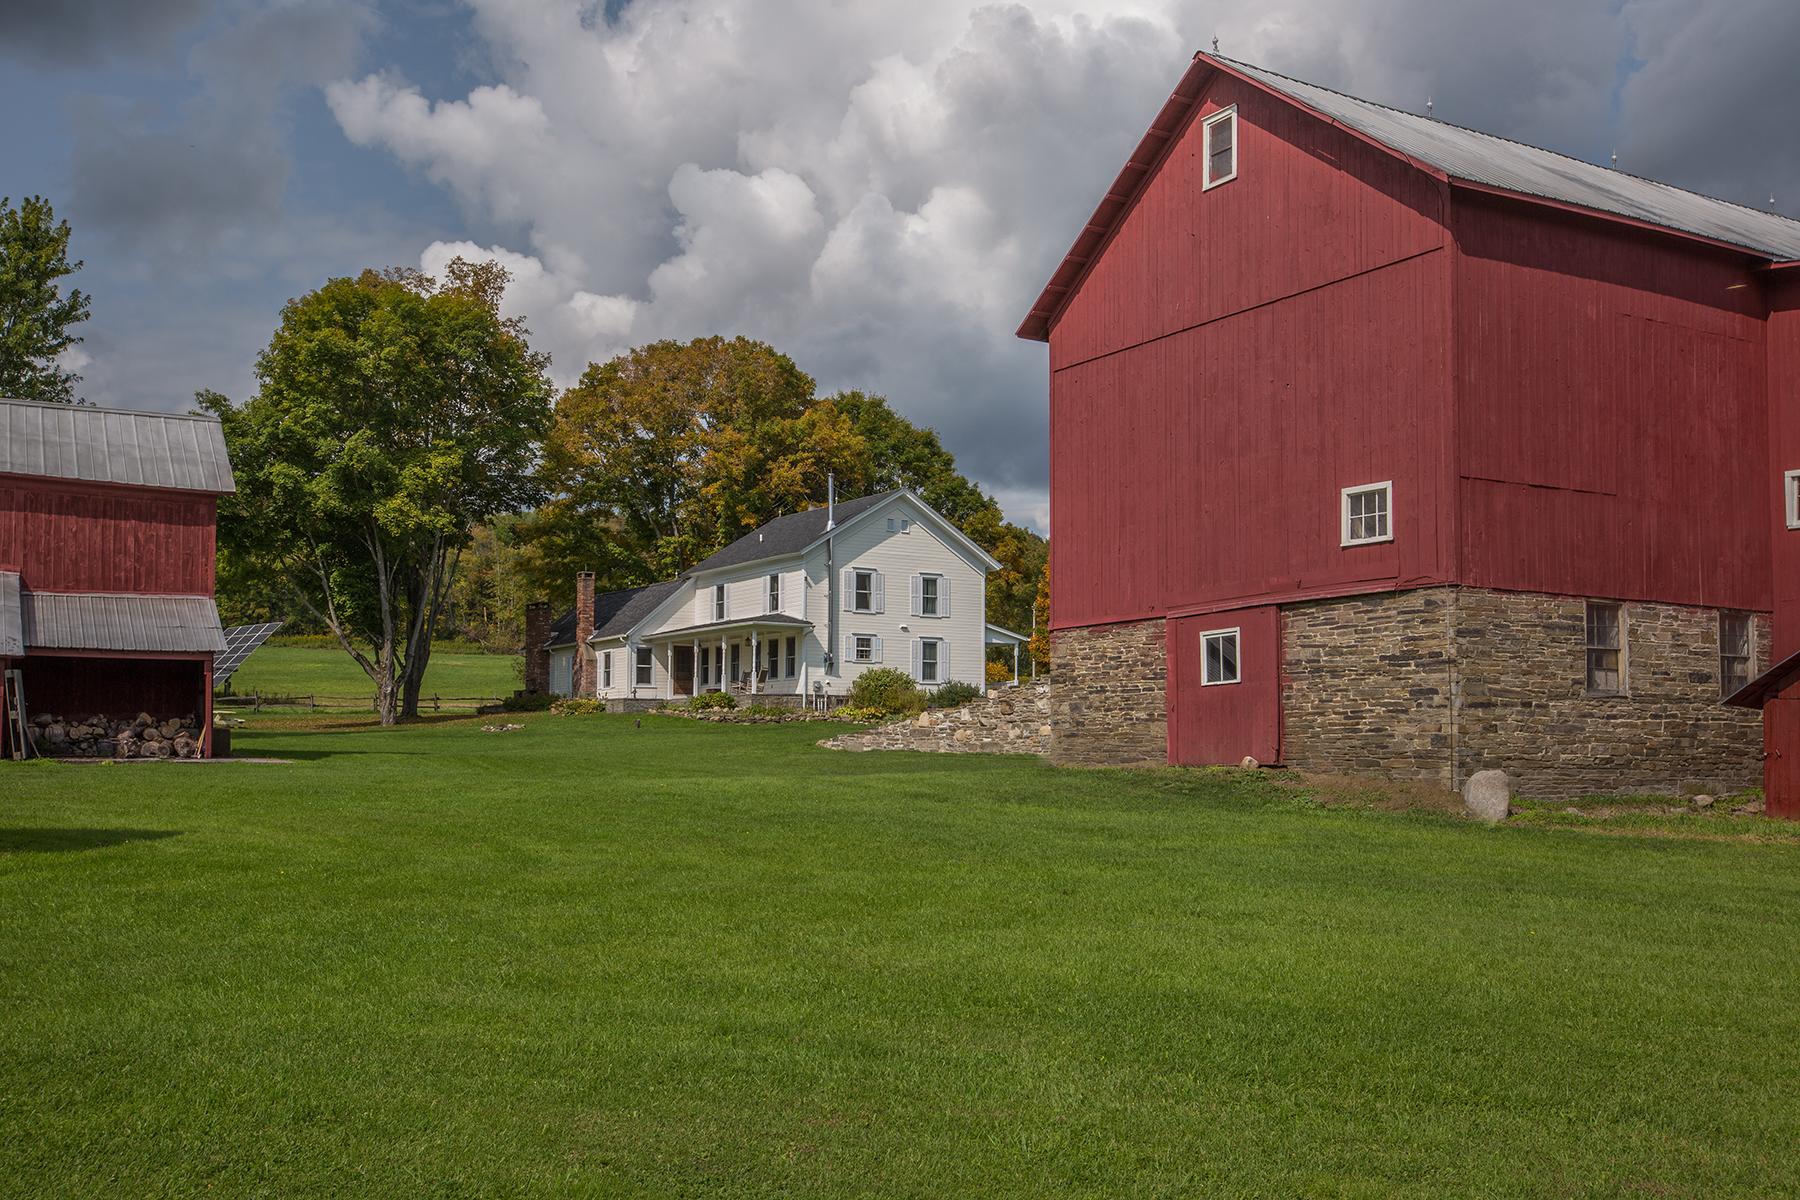 house through barns.jpg